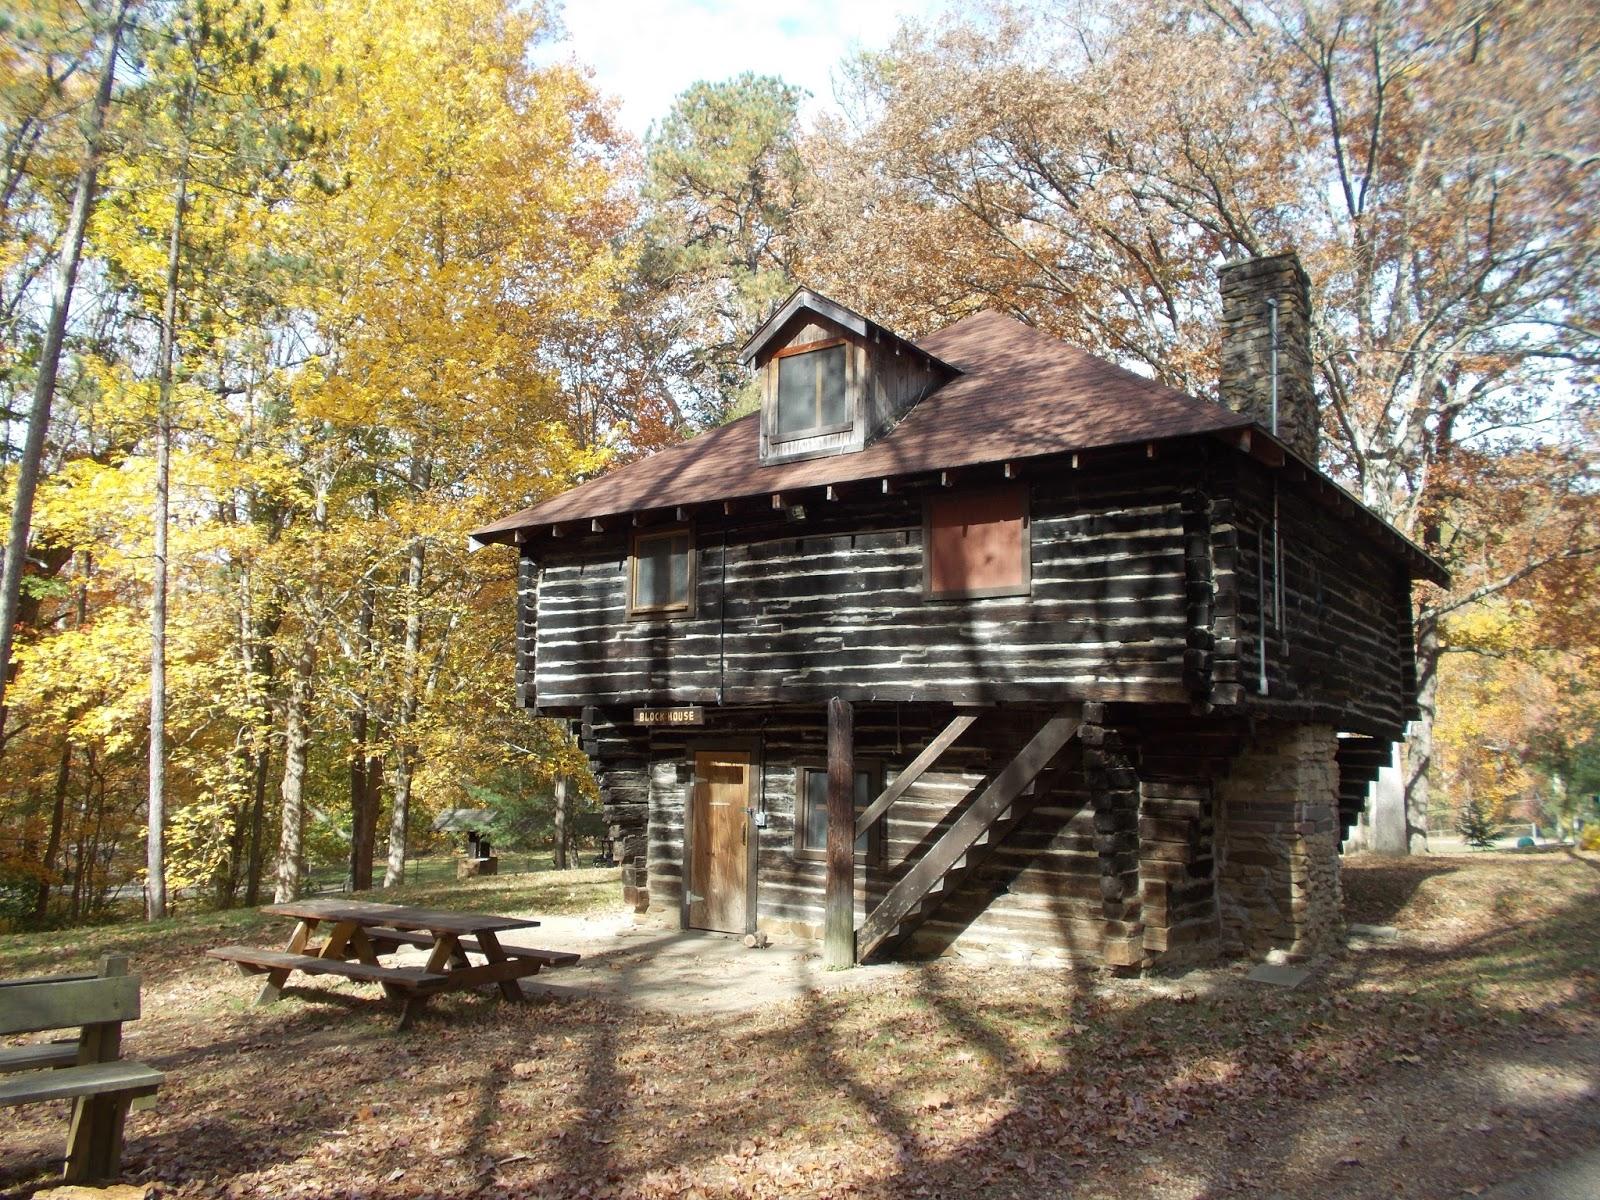 The Log Blog Boy Scout Log Cabins - Camp Oyo-6843